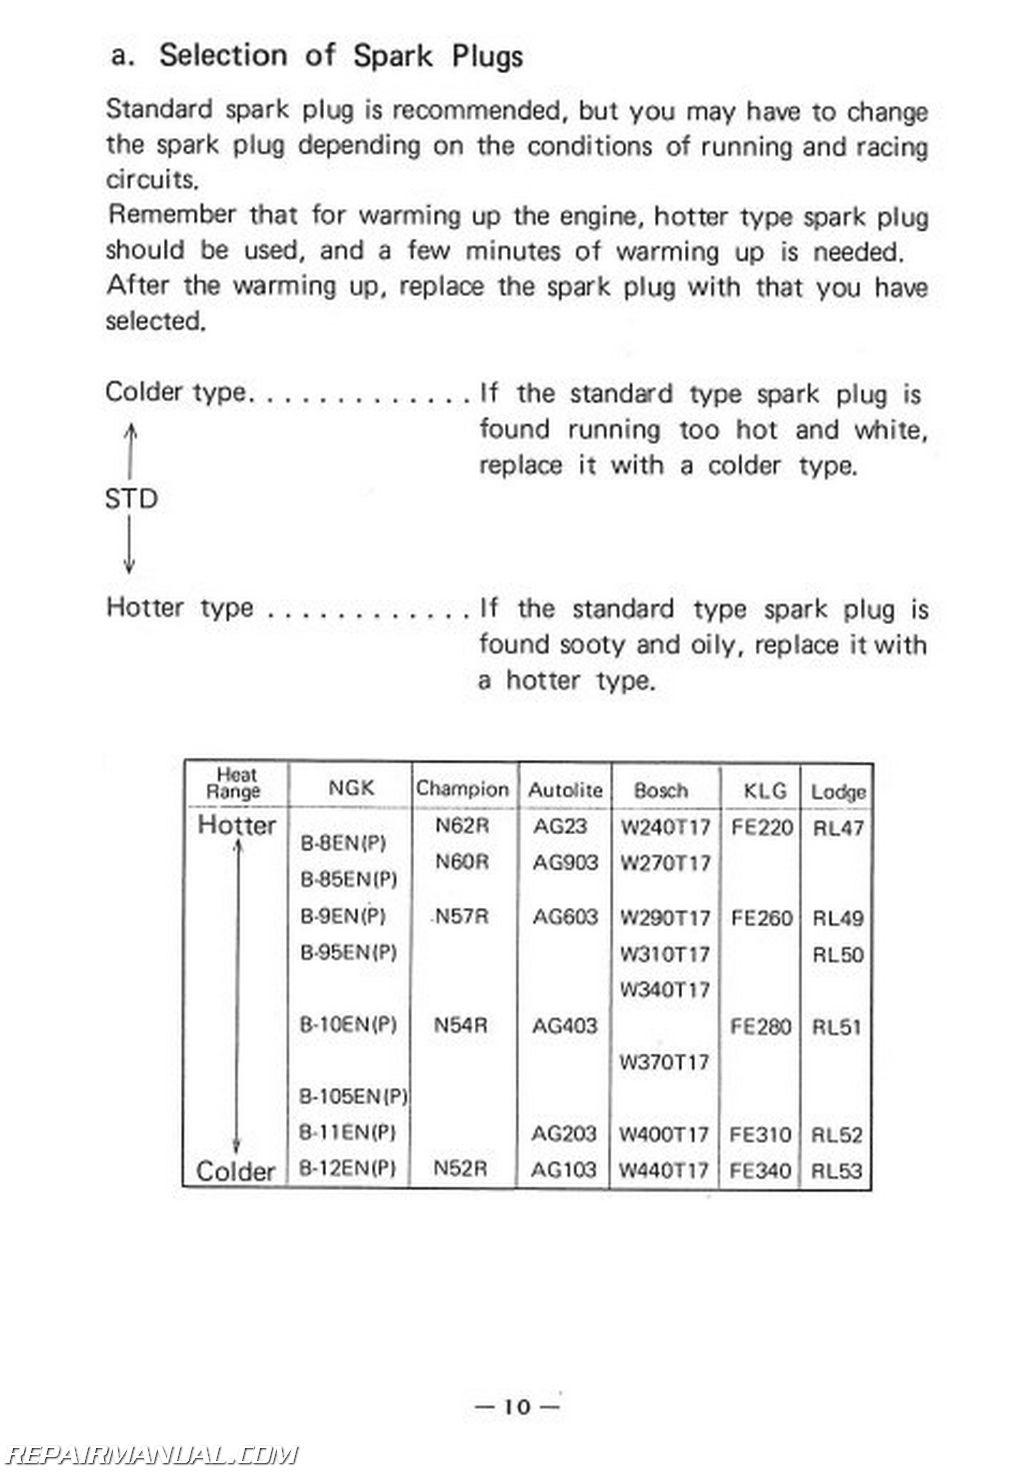 LIT-11623-63-01page-1 Yamaha Mx Wiring Diagram on